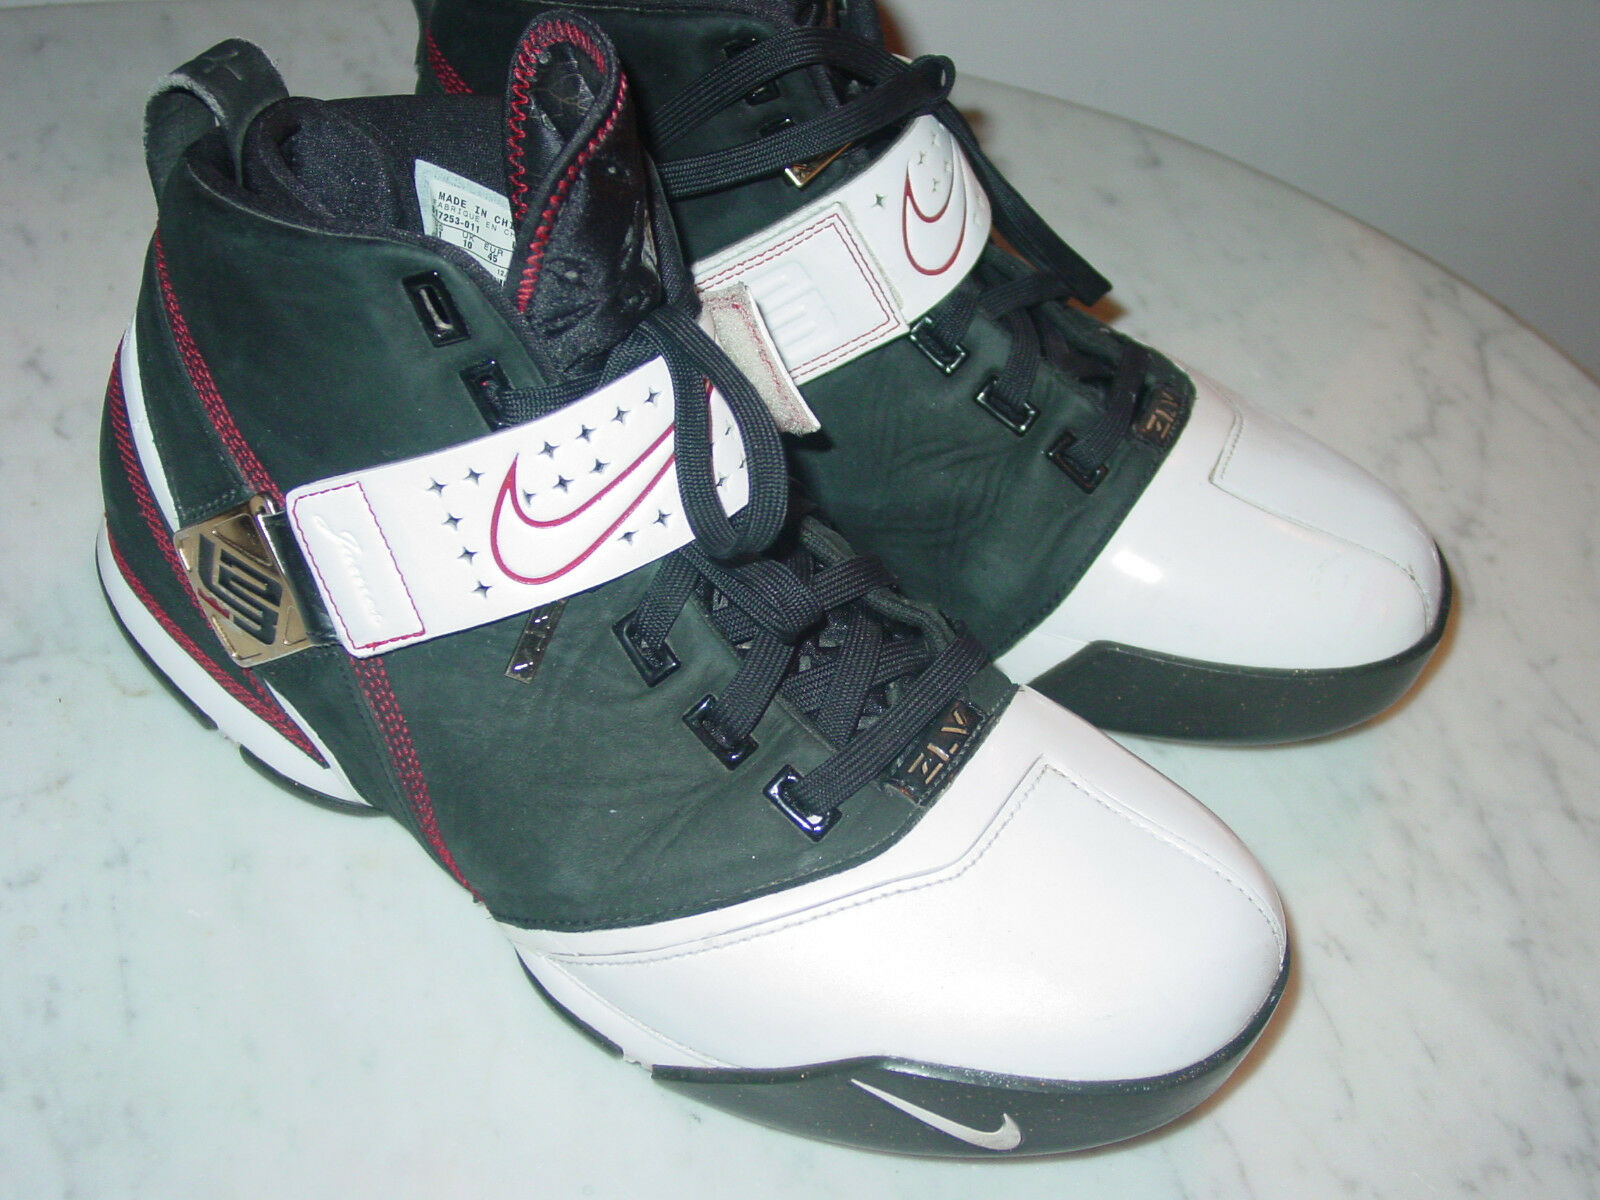 2007 Nike Air Zoom Lebron 5 Fearless Black/White/Crimson/Black Shoes  Size 11